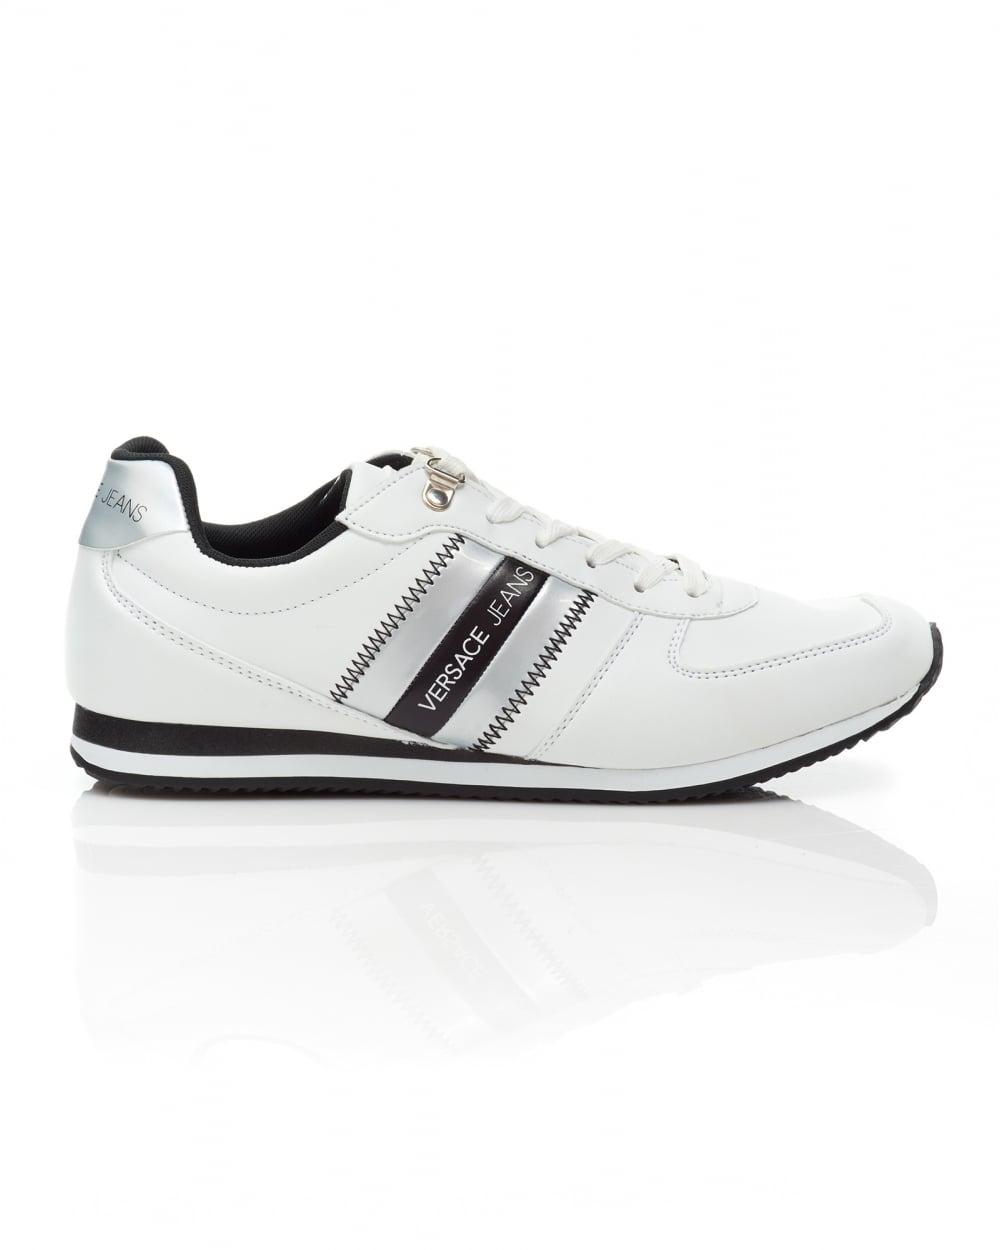 2c1e7f83cca7 Versace Jeans Mens Stripe Logo Trainers